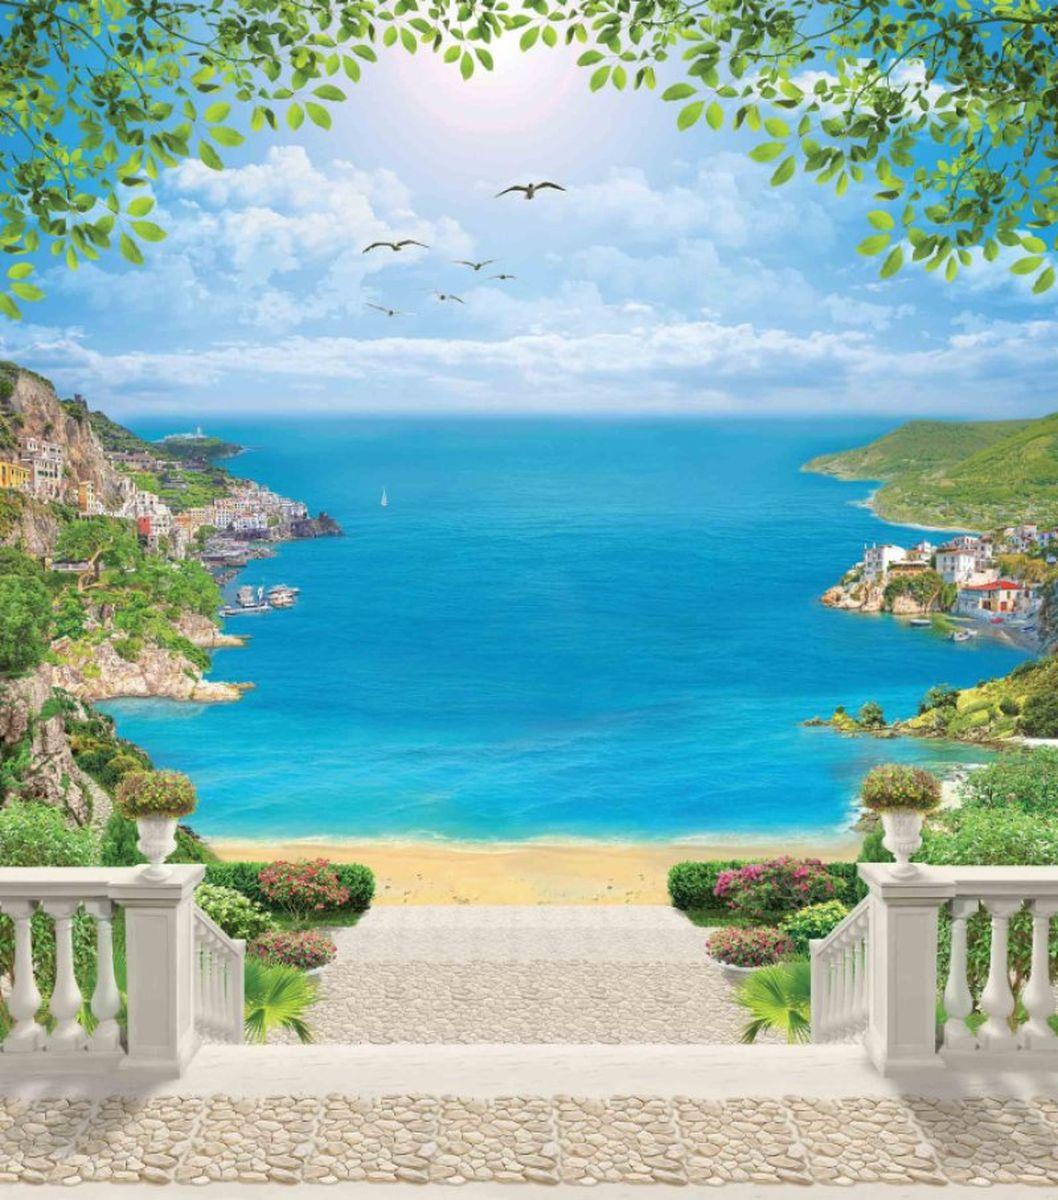 Панно декоративное Твоя Планета Лазурный берег, 210 х 238 см4607161053058